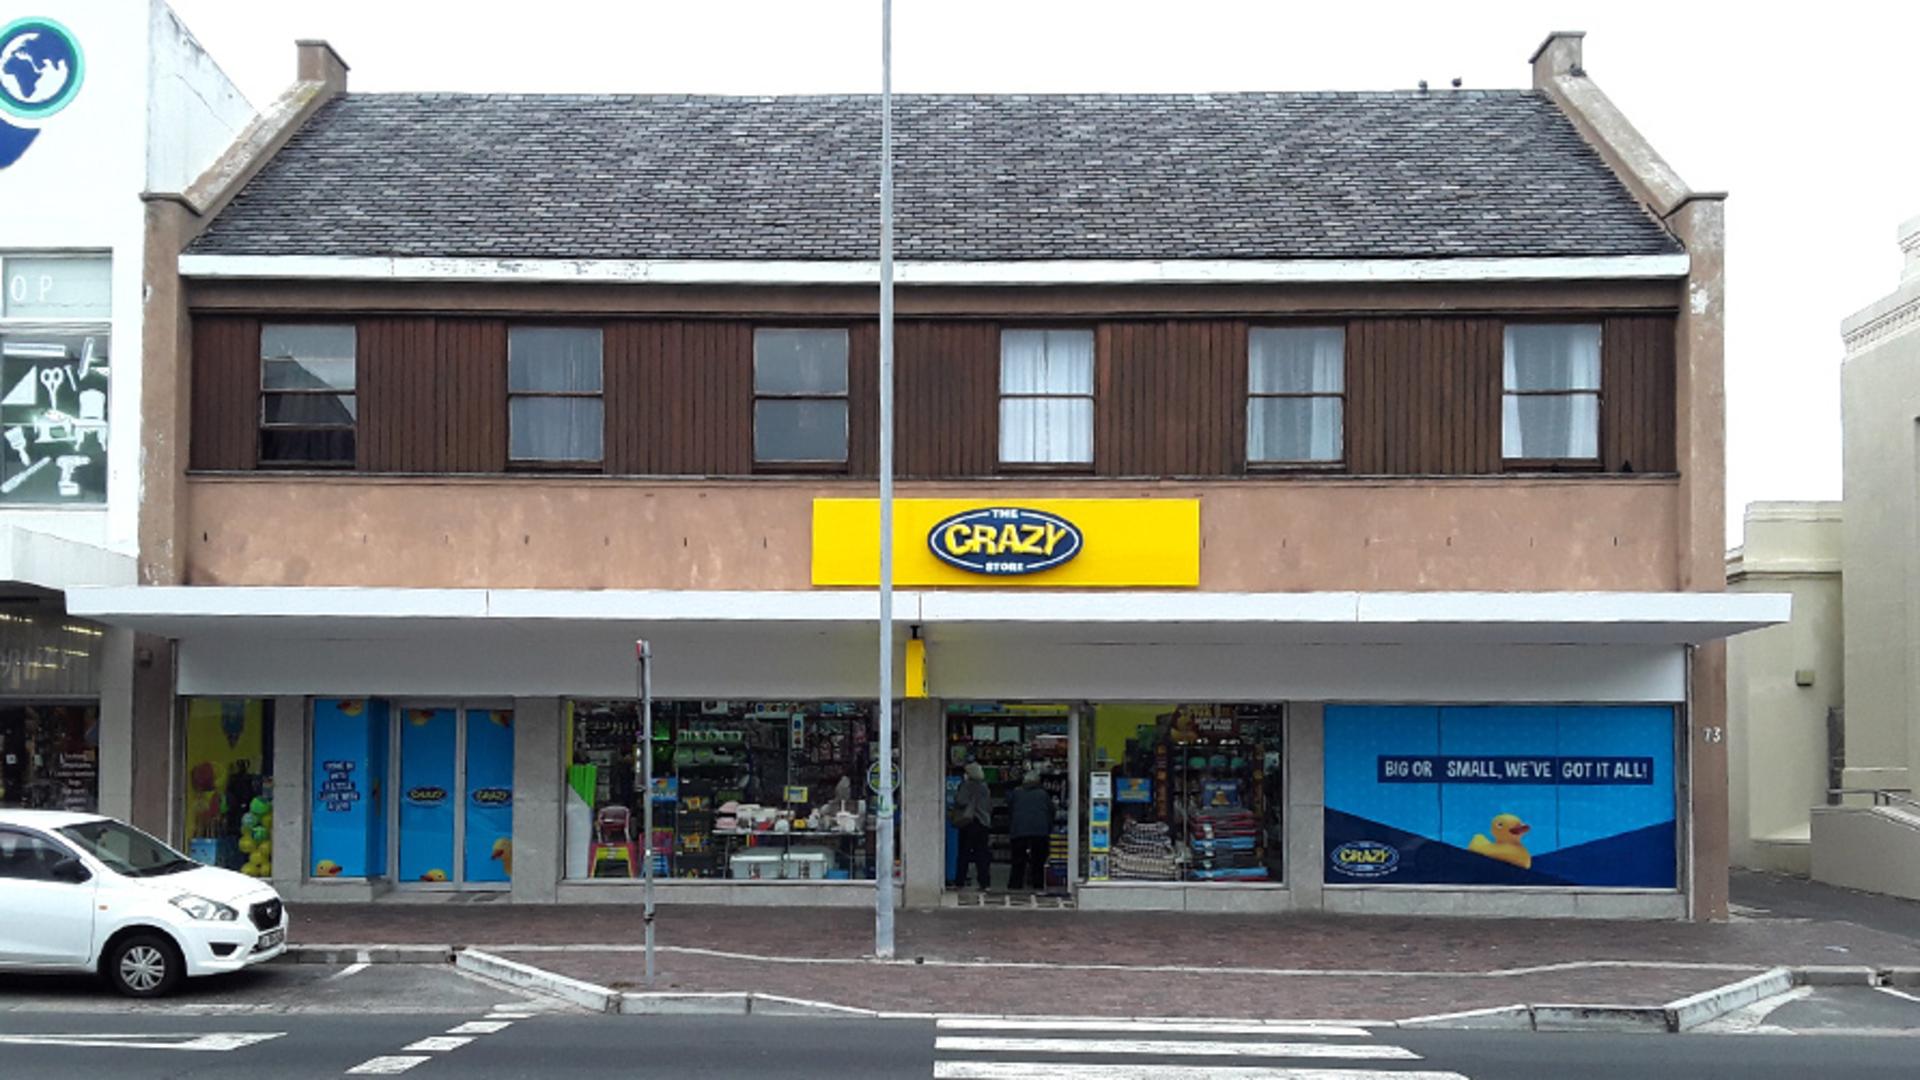 The Crazy Store Main Road, Fish Hoek